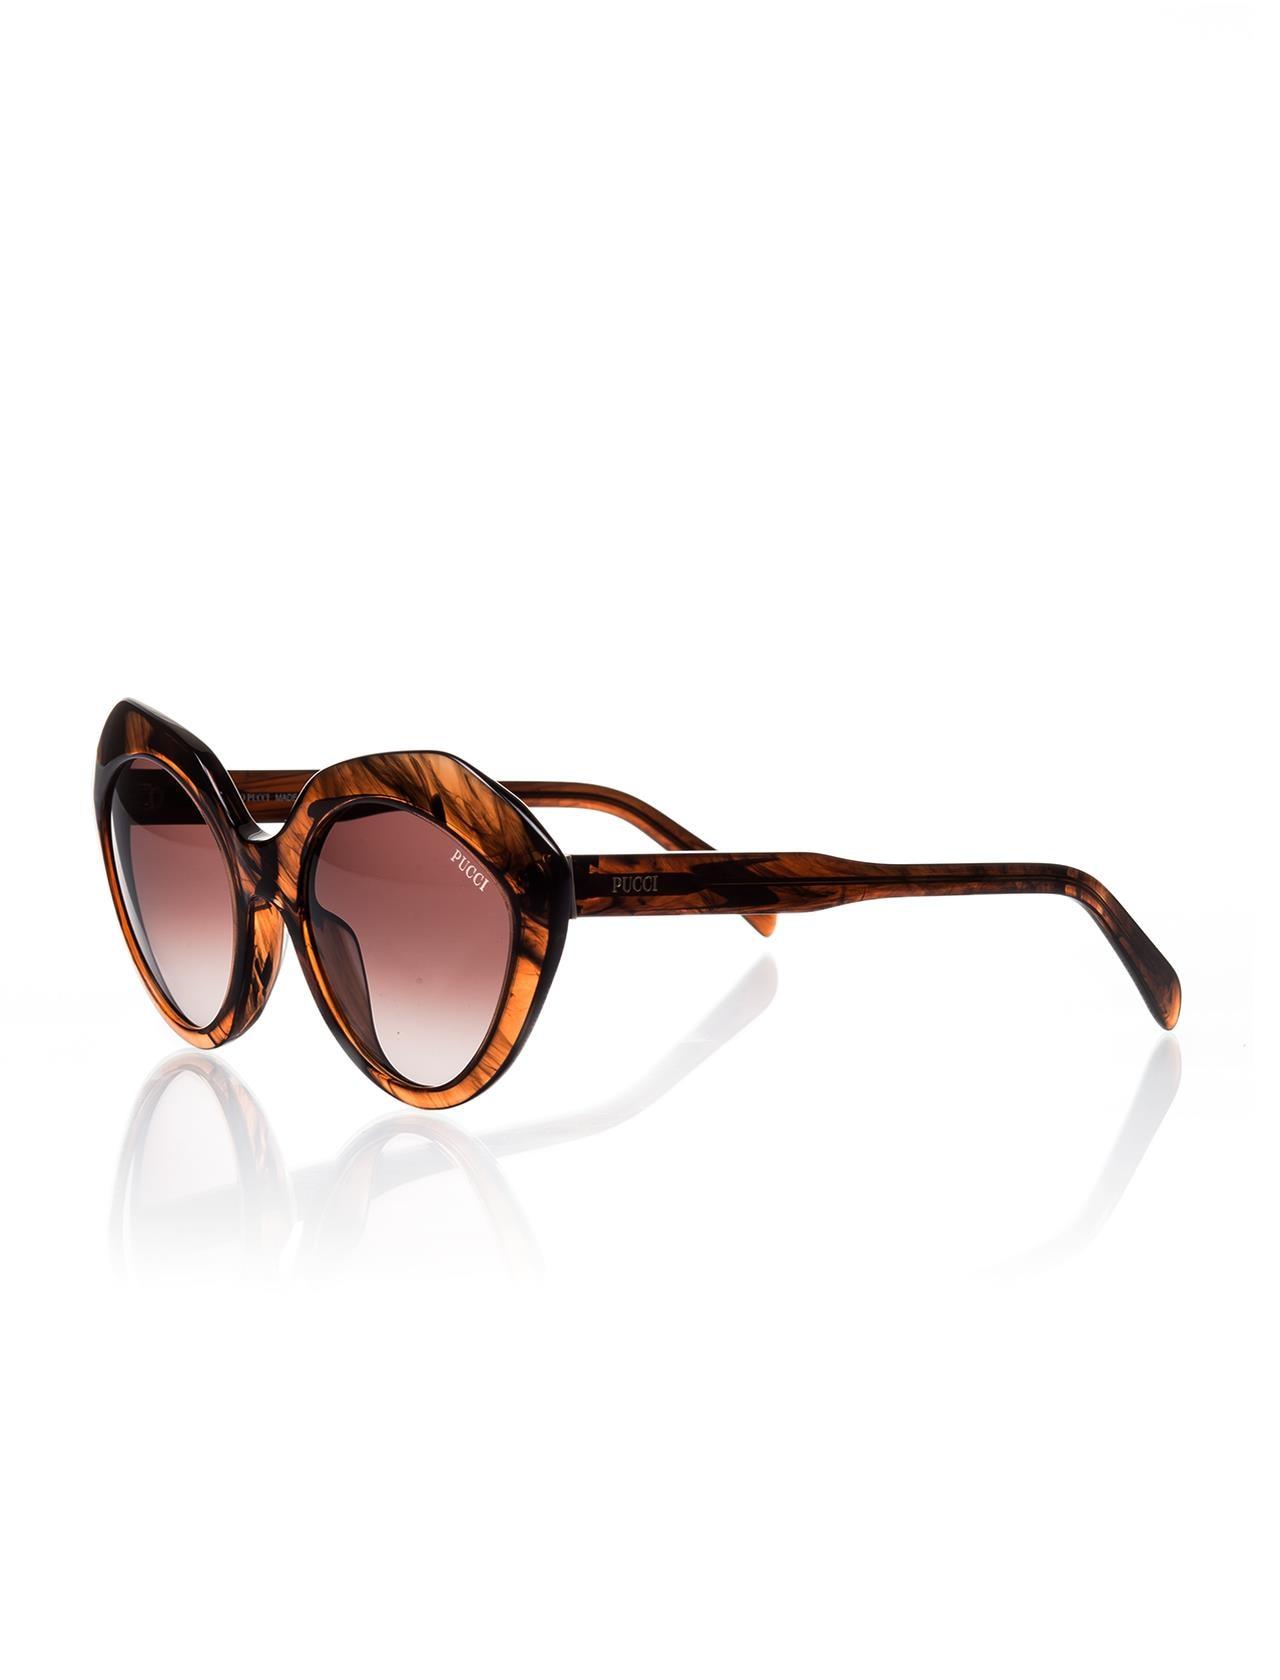 Women's sunglasses ep 0041 50s bone Brown organic oval cat eye 53-19-140 emilio pucci